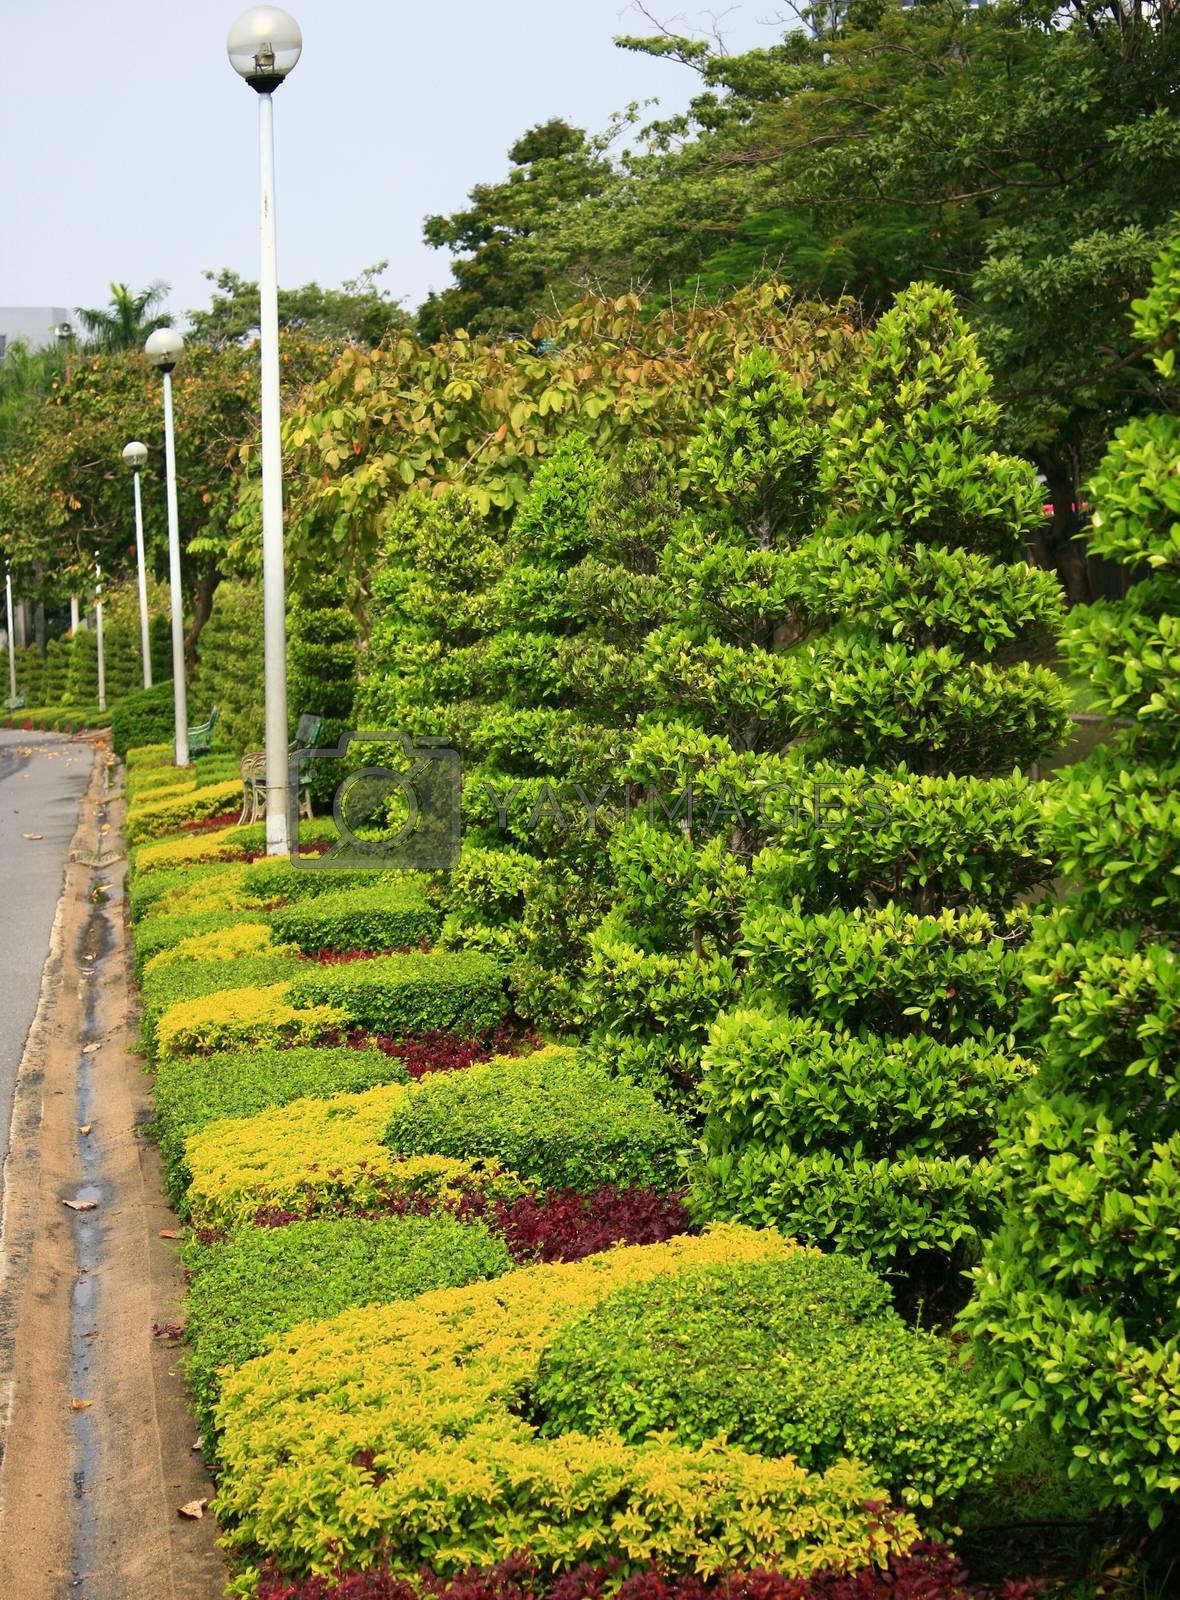 rows of tree in garden  by studio2013